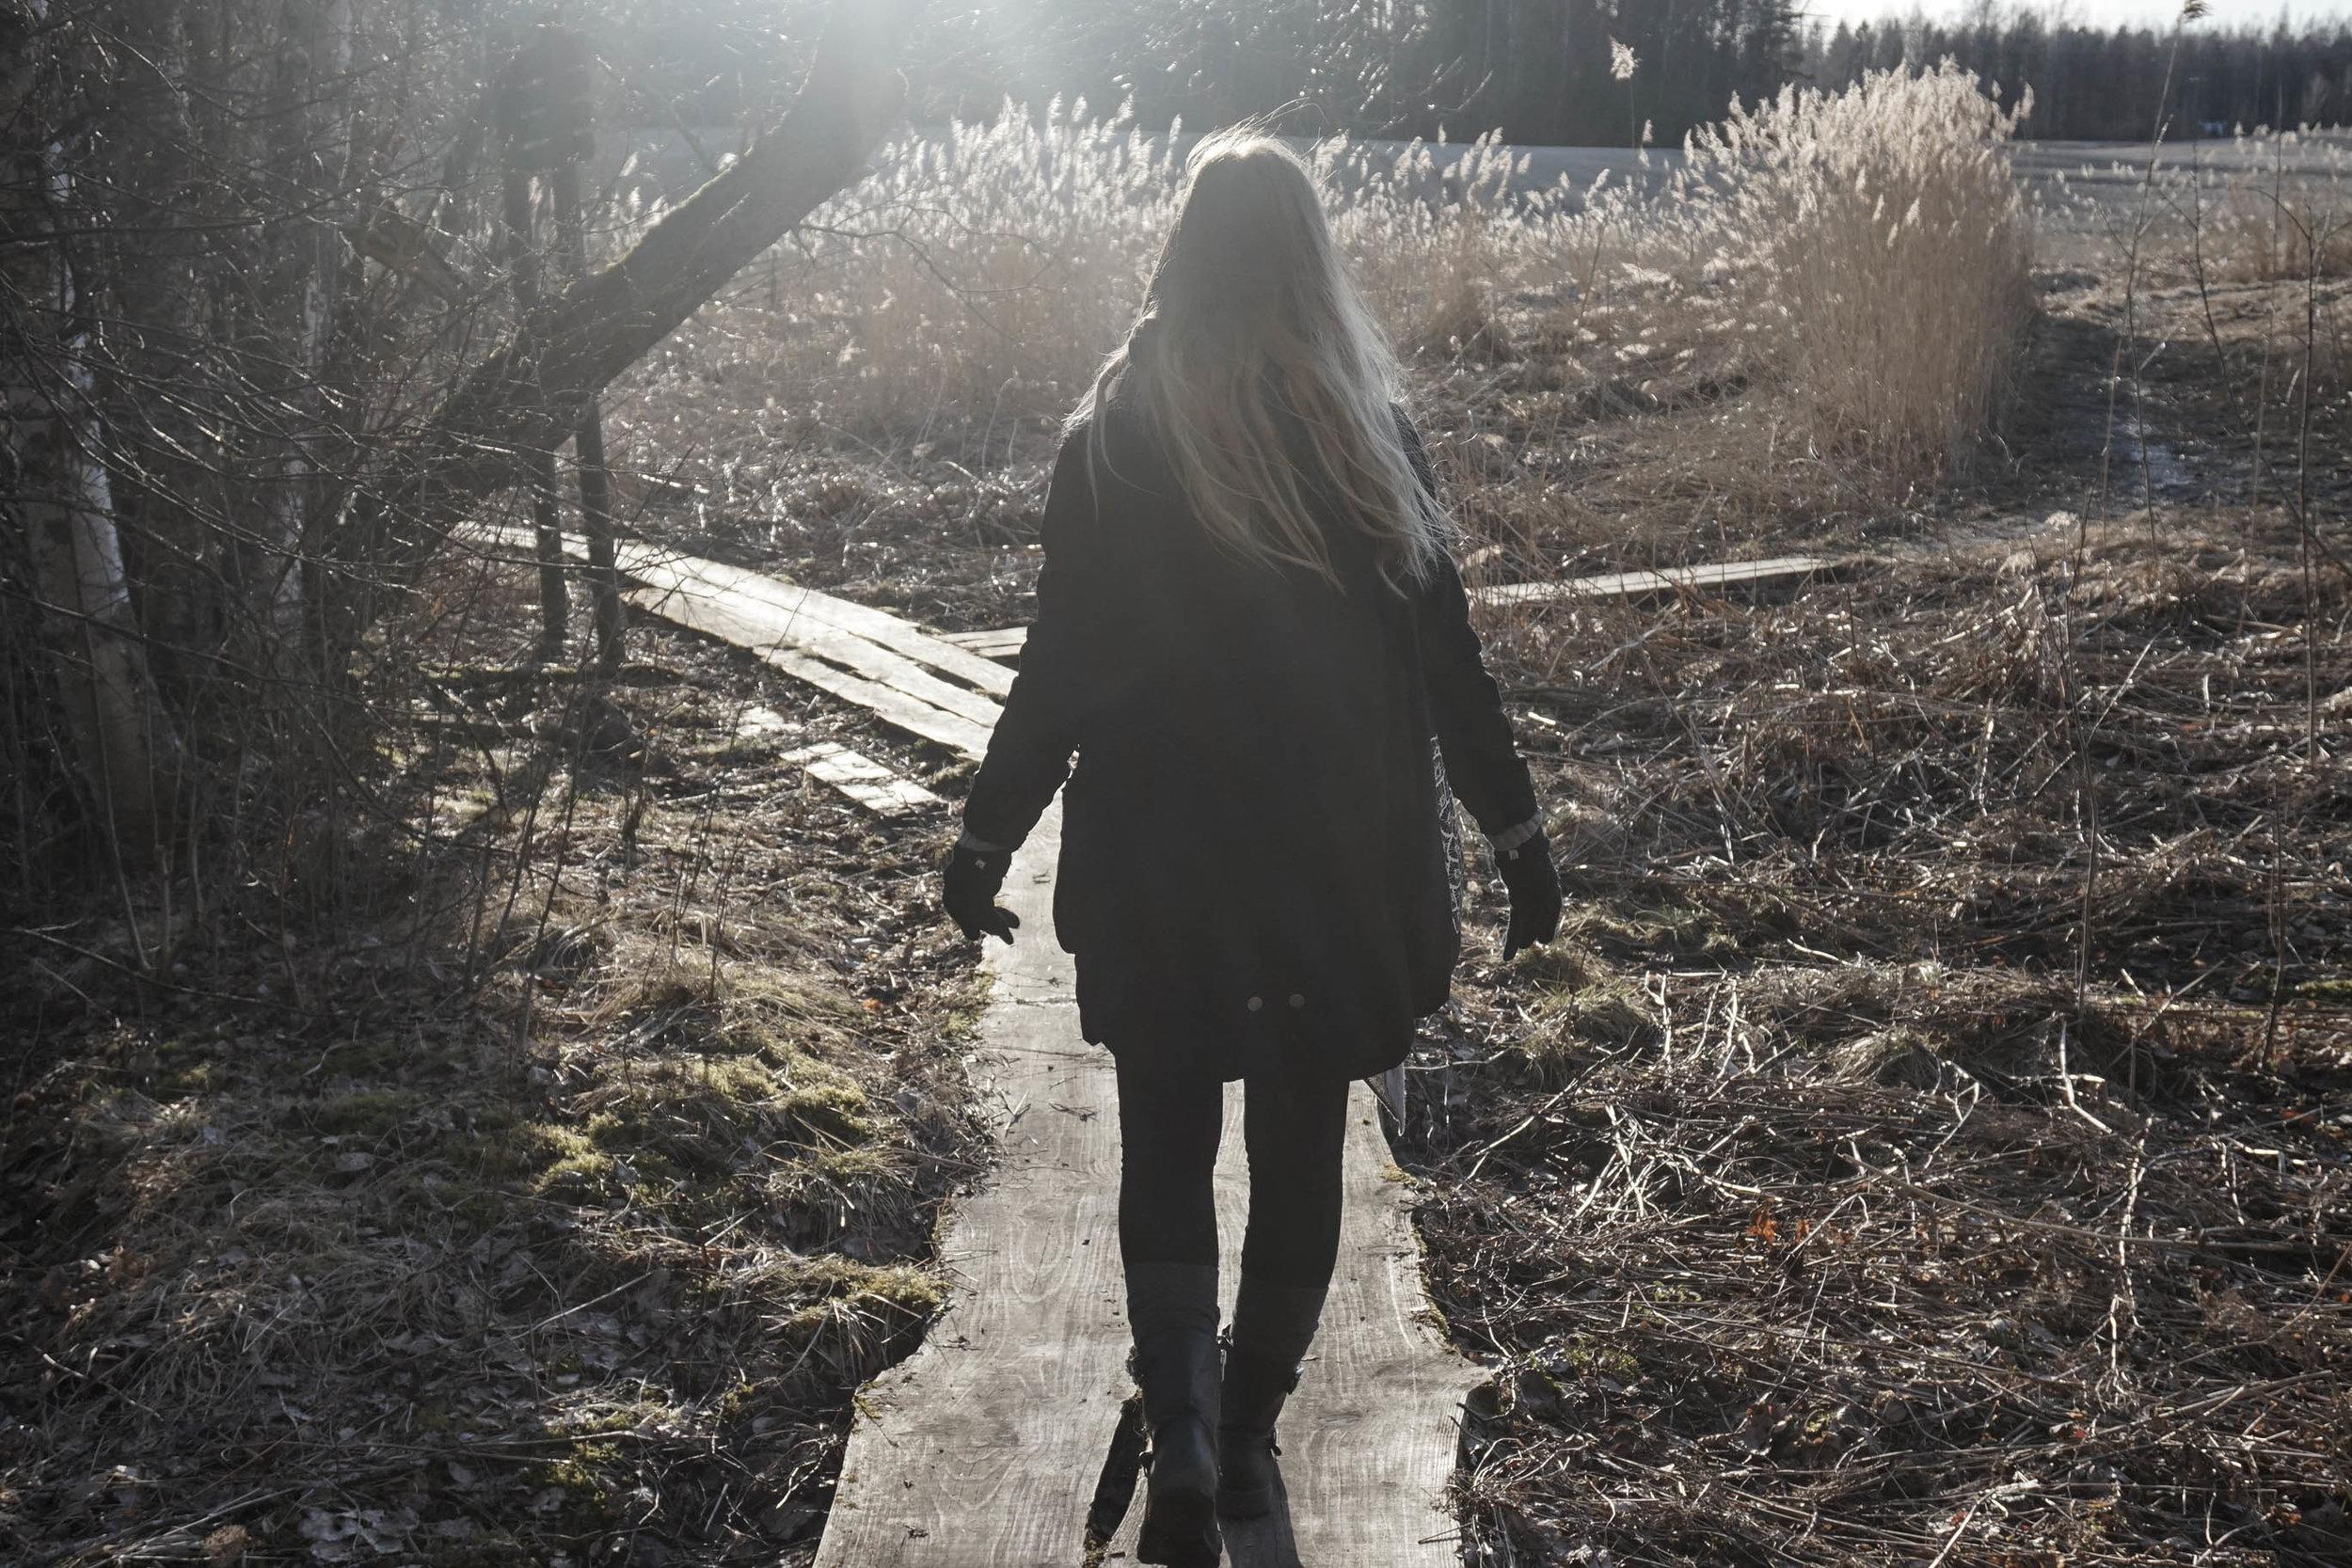 woman_who_walks_alone